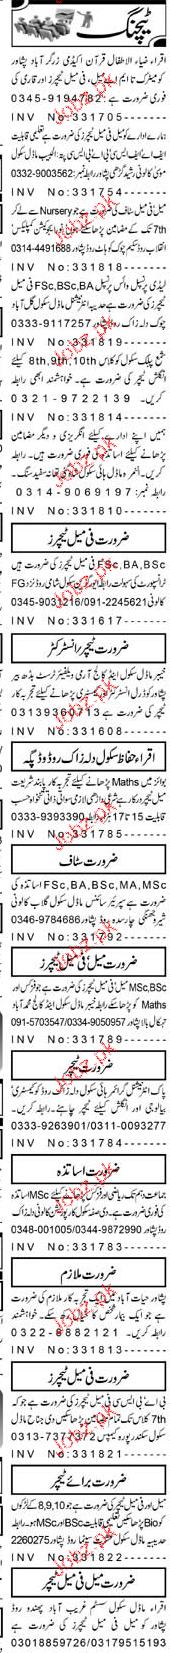 Principal, Vice Principal, Teachers Job Opportunity